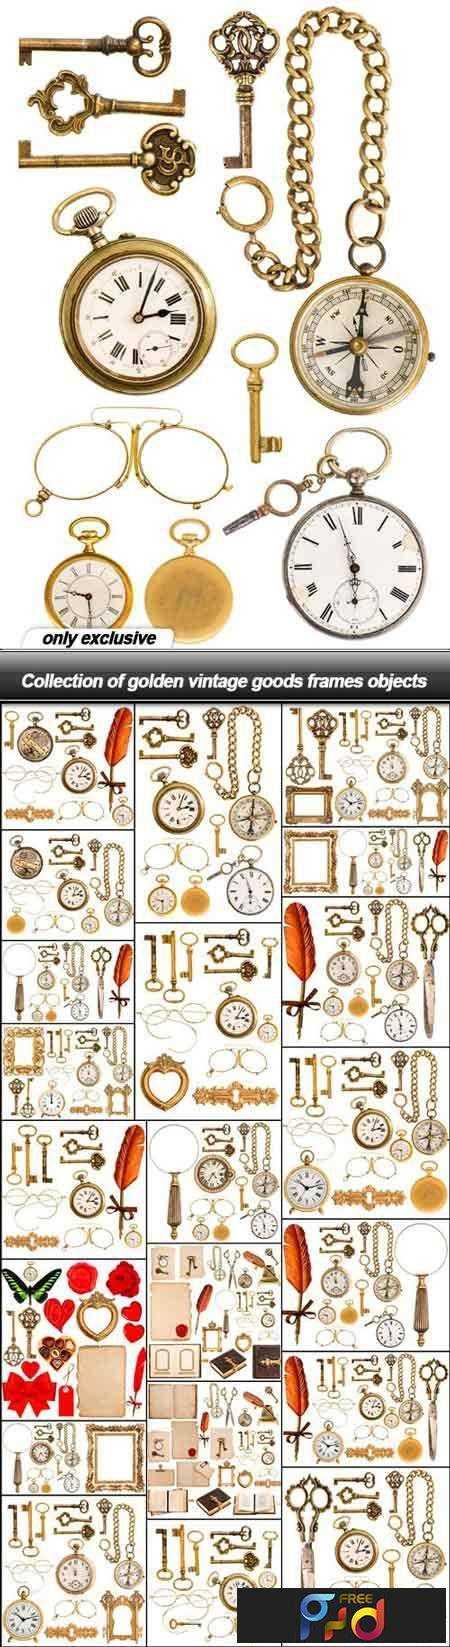 freepsdvn-com_1477018529_collection-of-golden-vintage-goods-frames-objects-21-uhq-jpeg